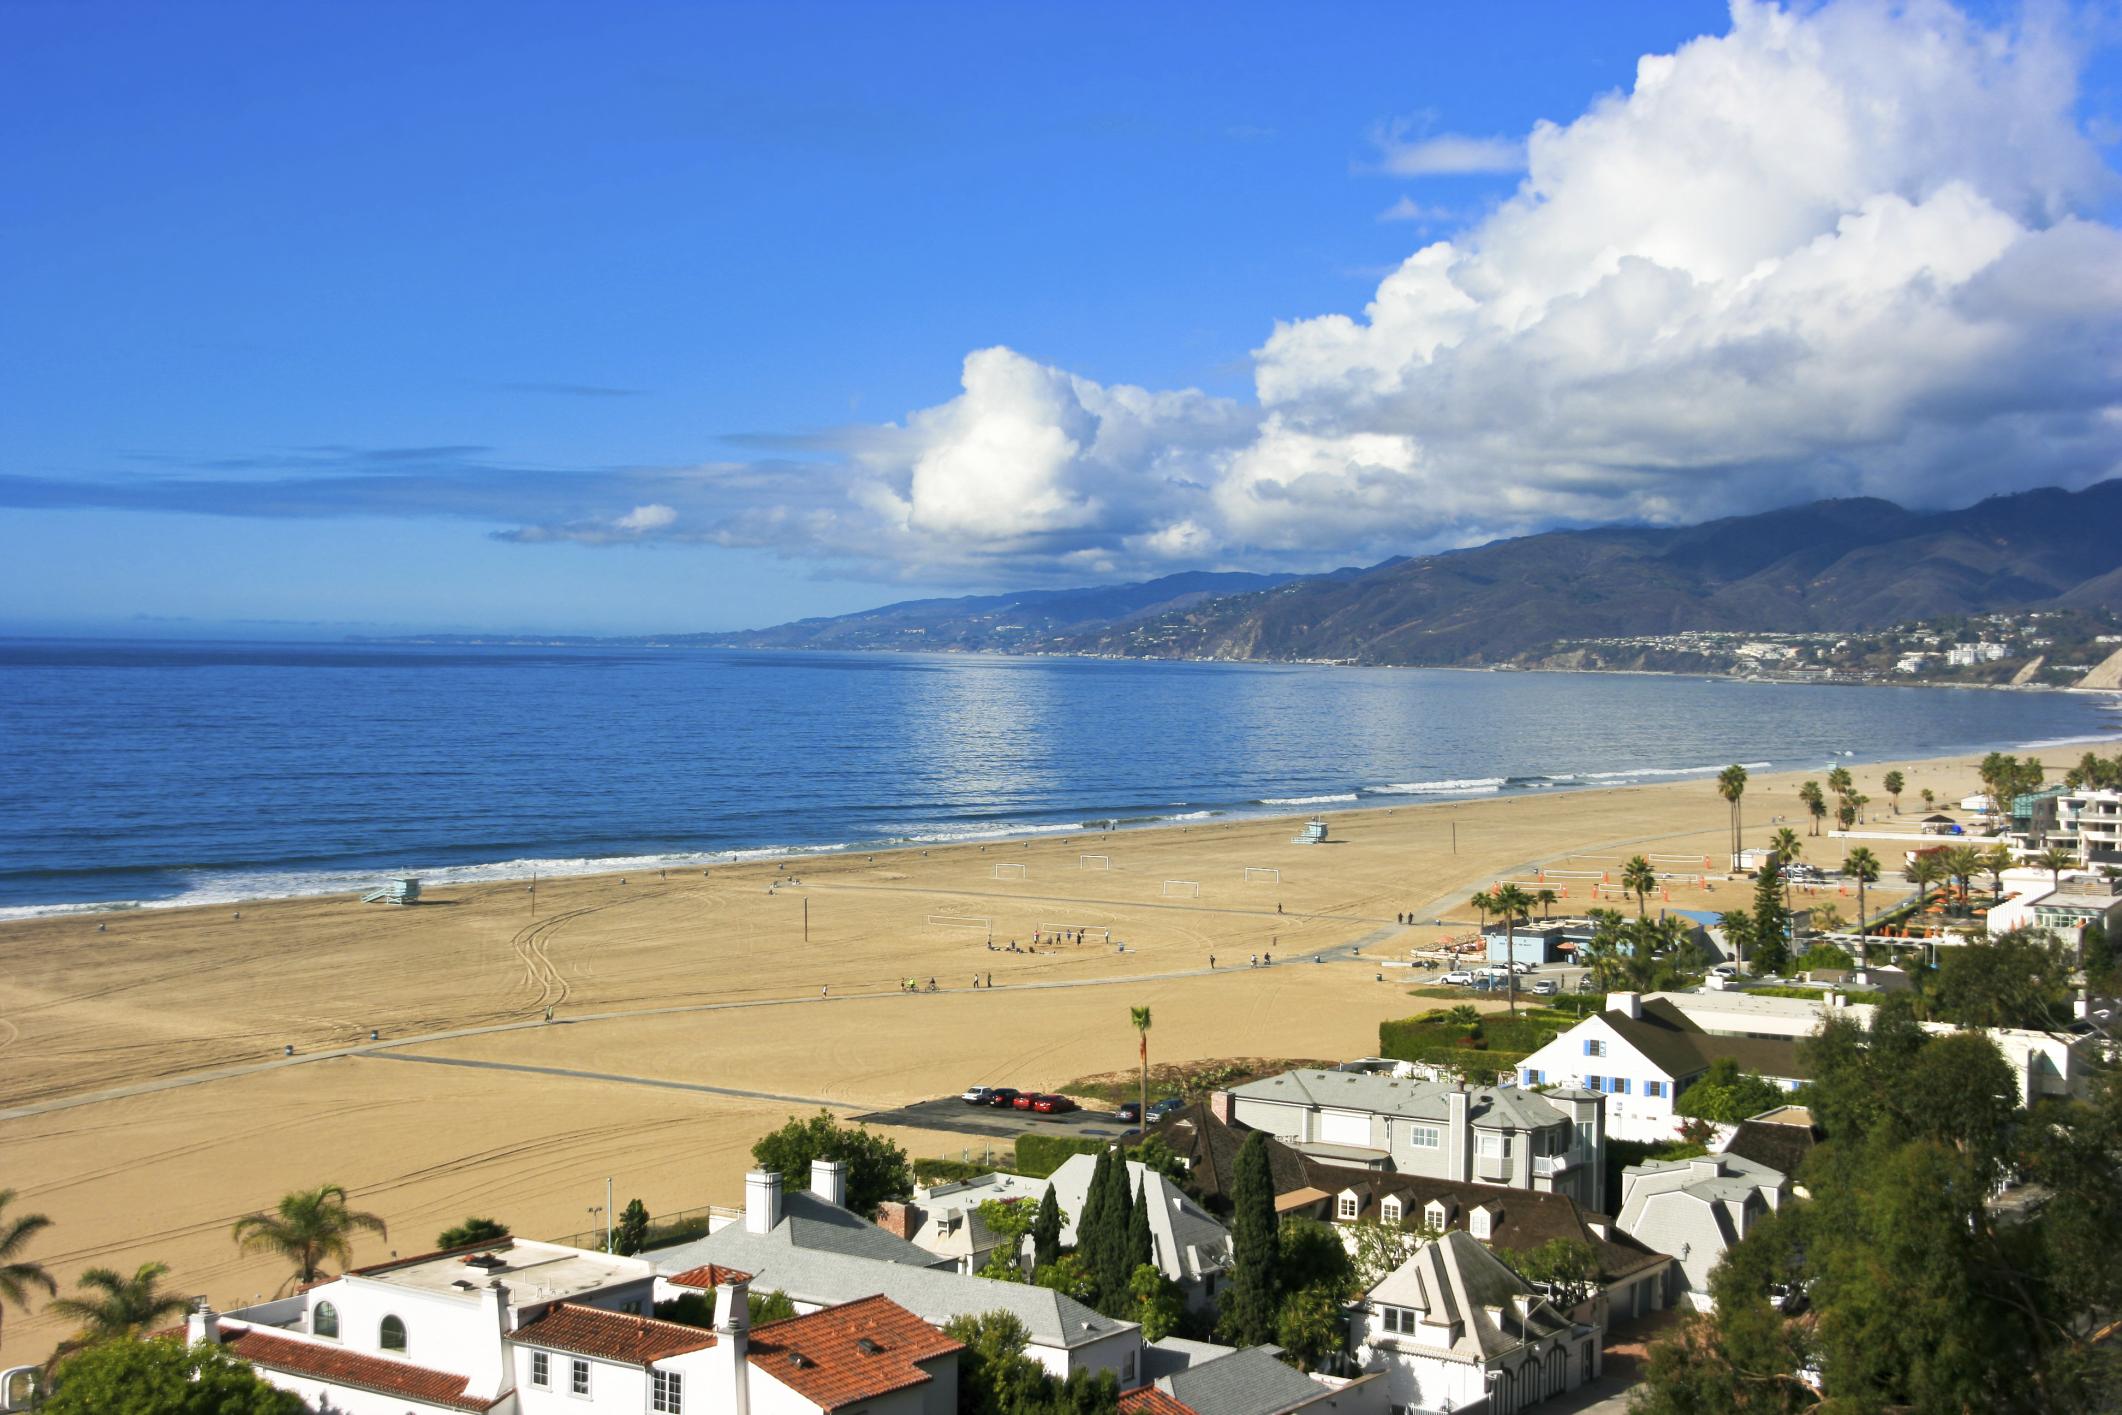 Weekend getaways in southern california for mother for Mother daughter weekend getaways